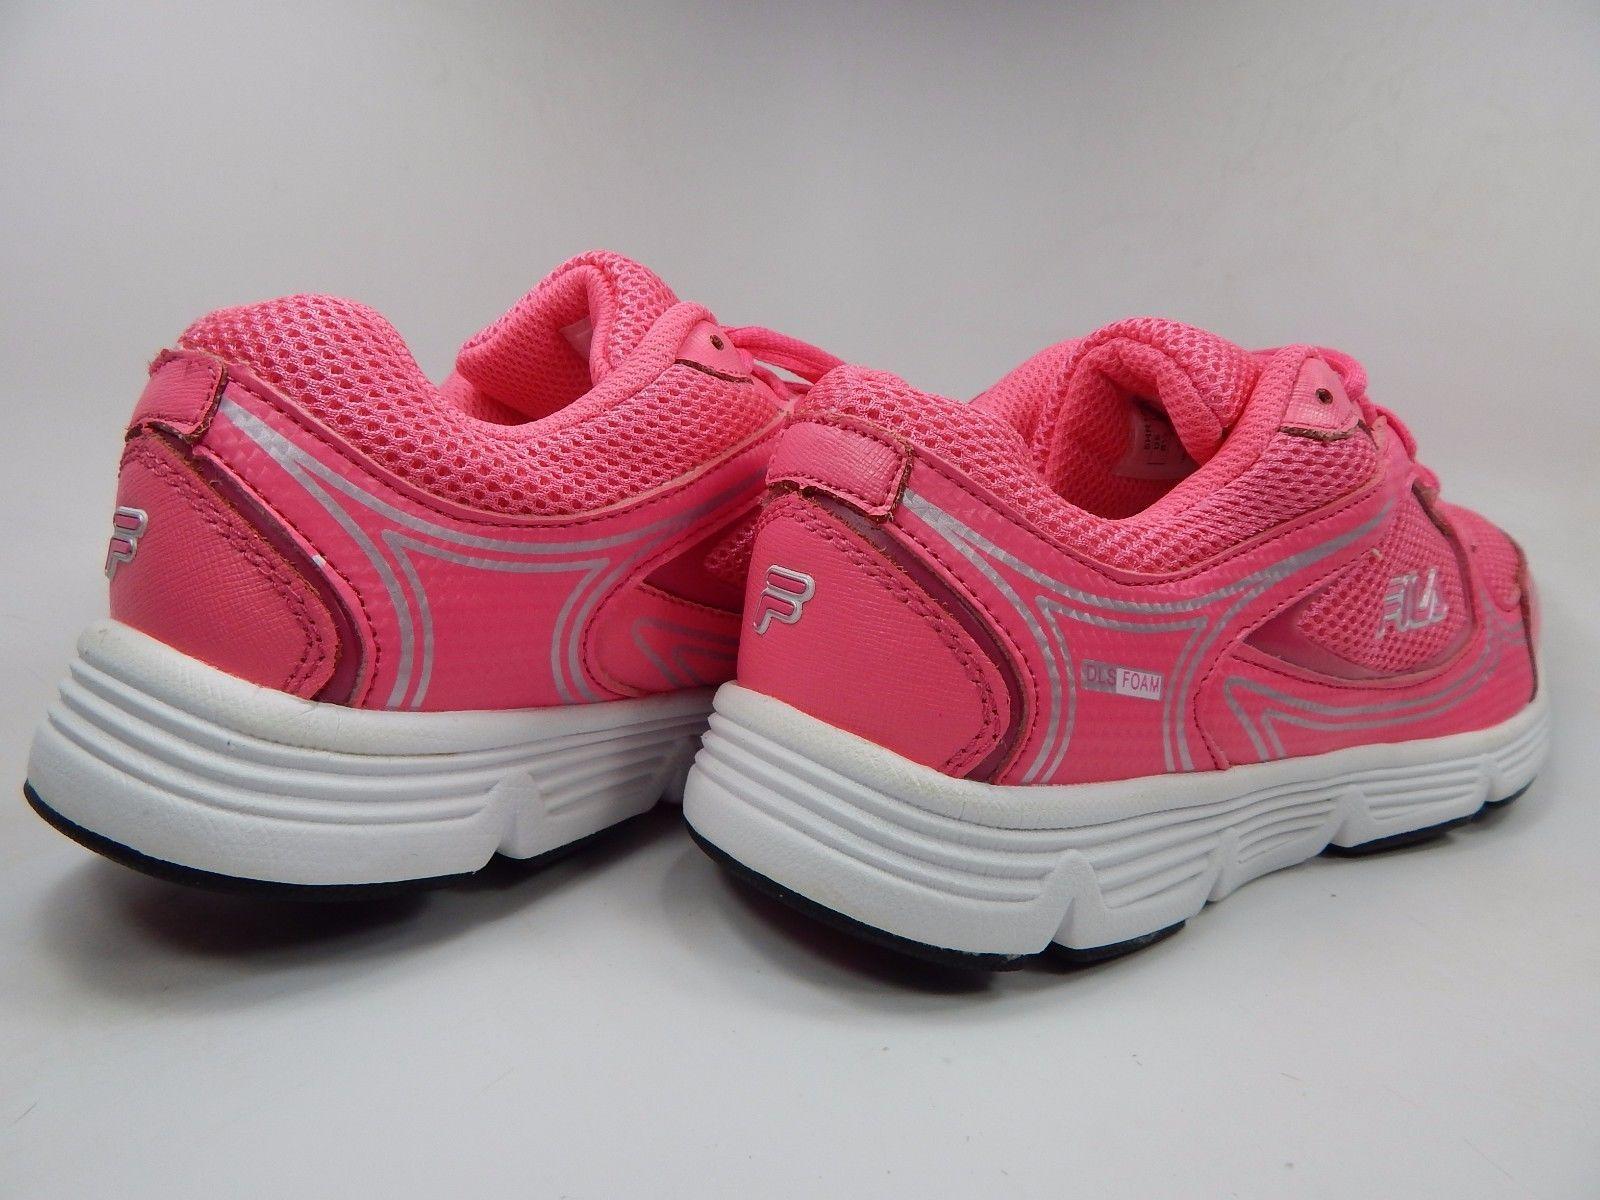 Fila Soar 2 Women's Running Shoes Size US 8.5 M (B) EU 39.5 Pink 5HR18027-667